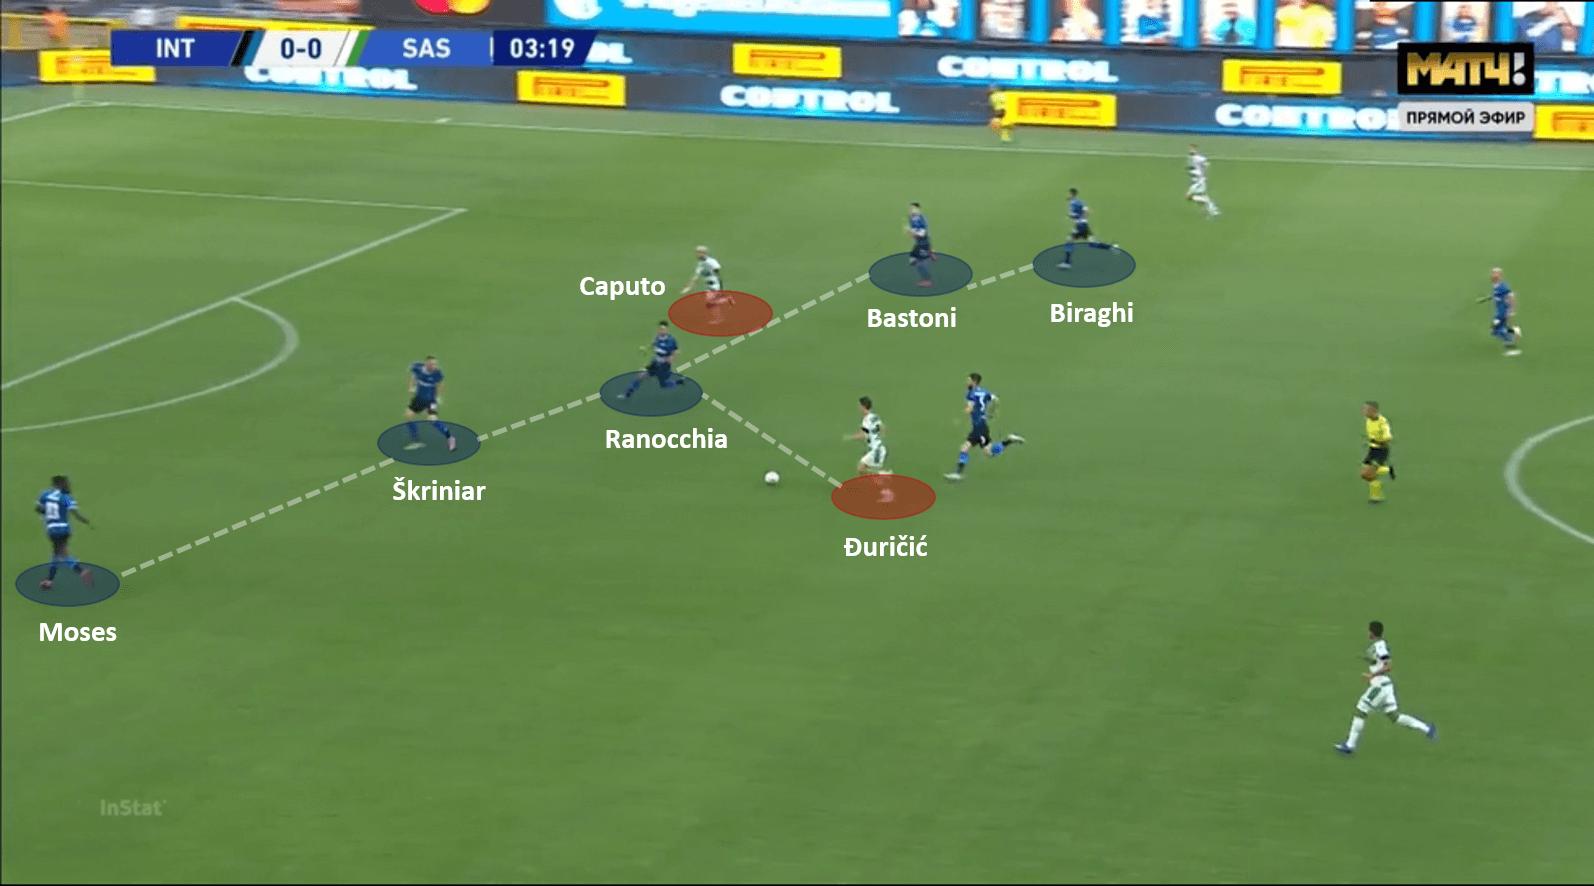 Serie A 2019/20: Inter vs Sassuolo – tactical analysis tactics